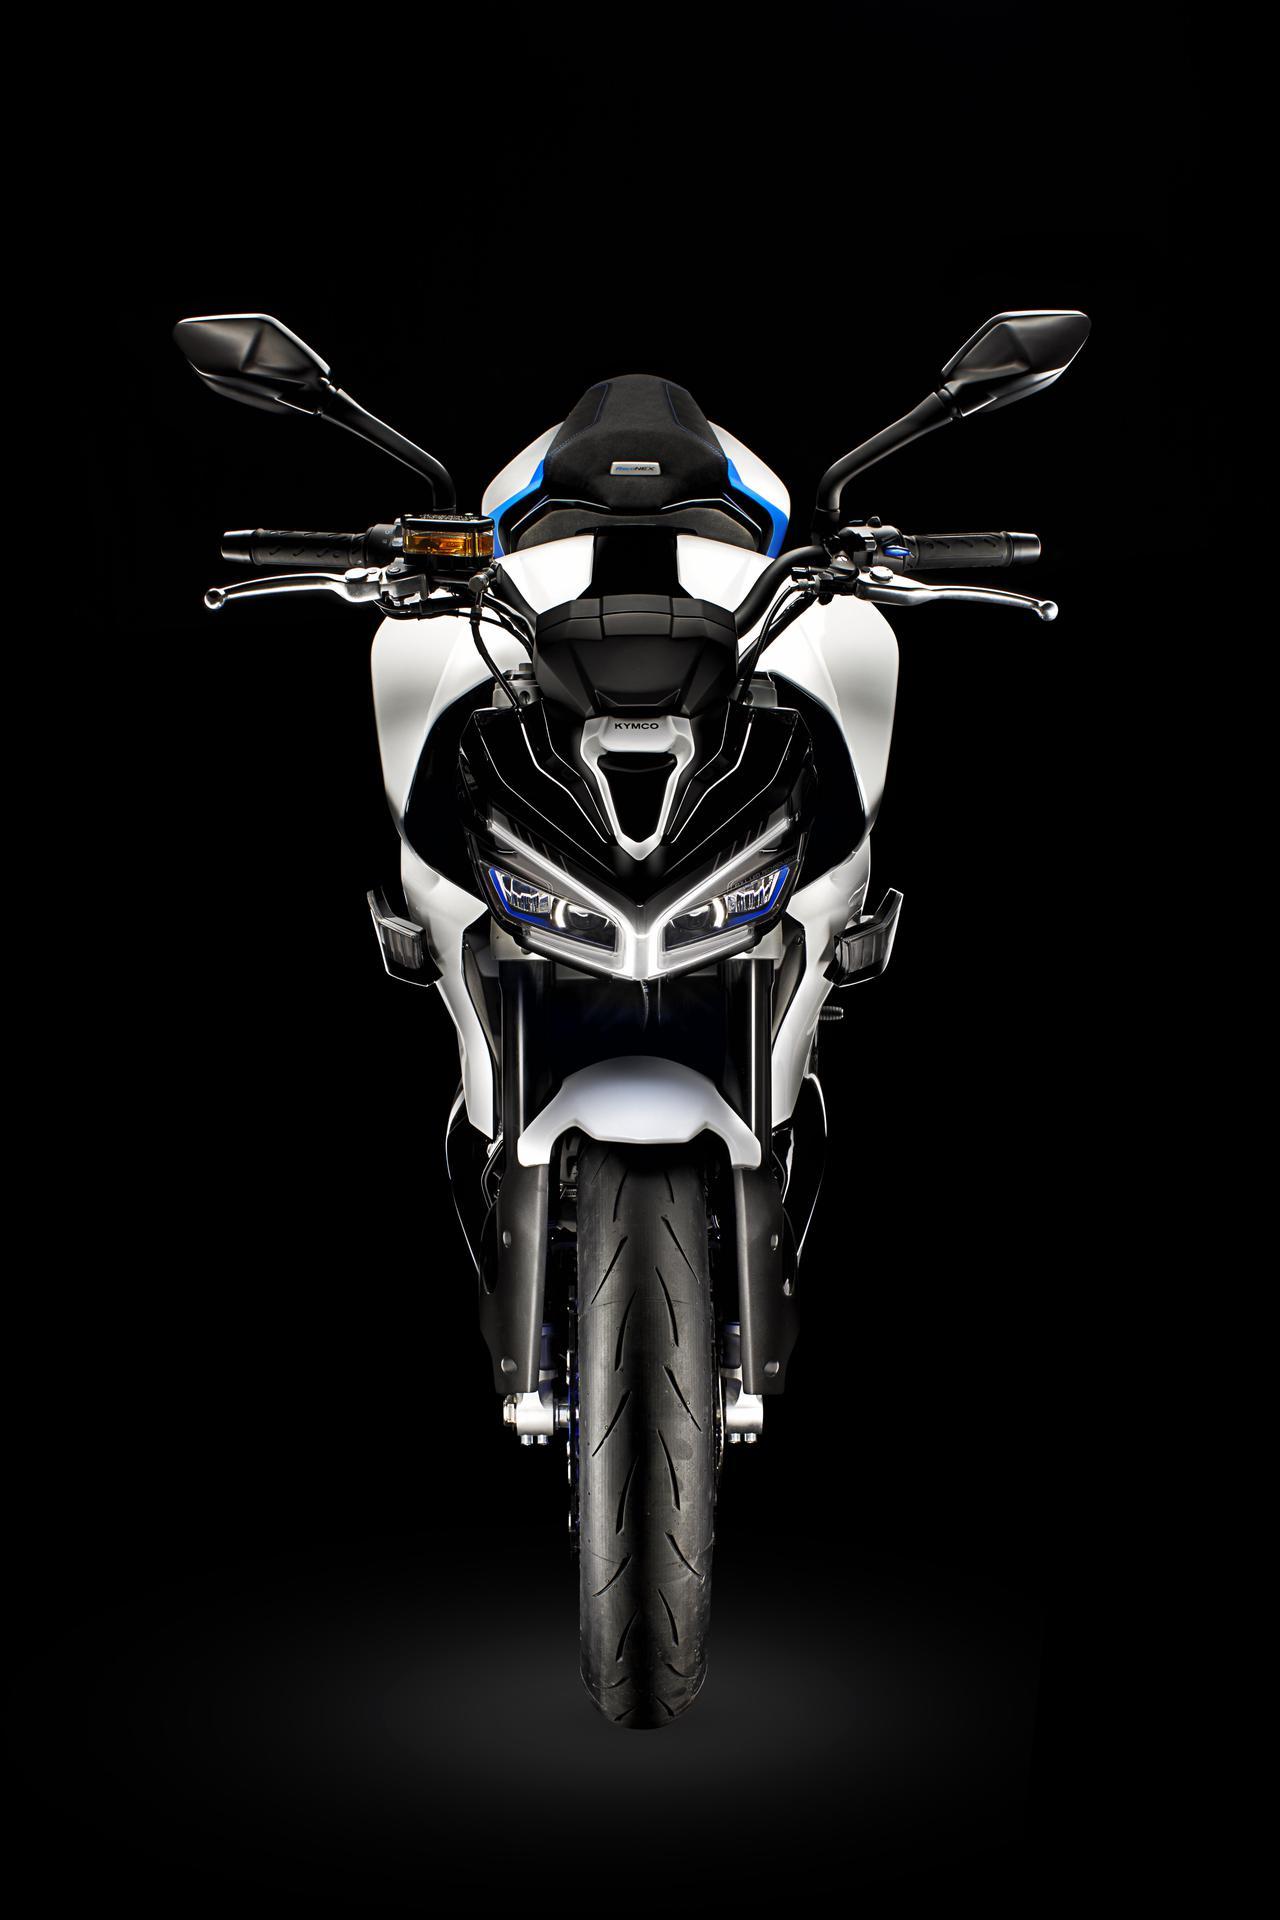 Images : 4番目の画像 - キムコ「RevoNEX」の写真を見る! - webオートバイ